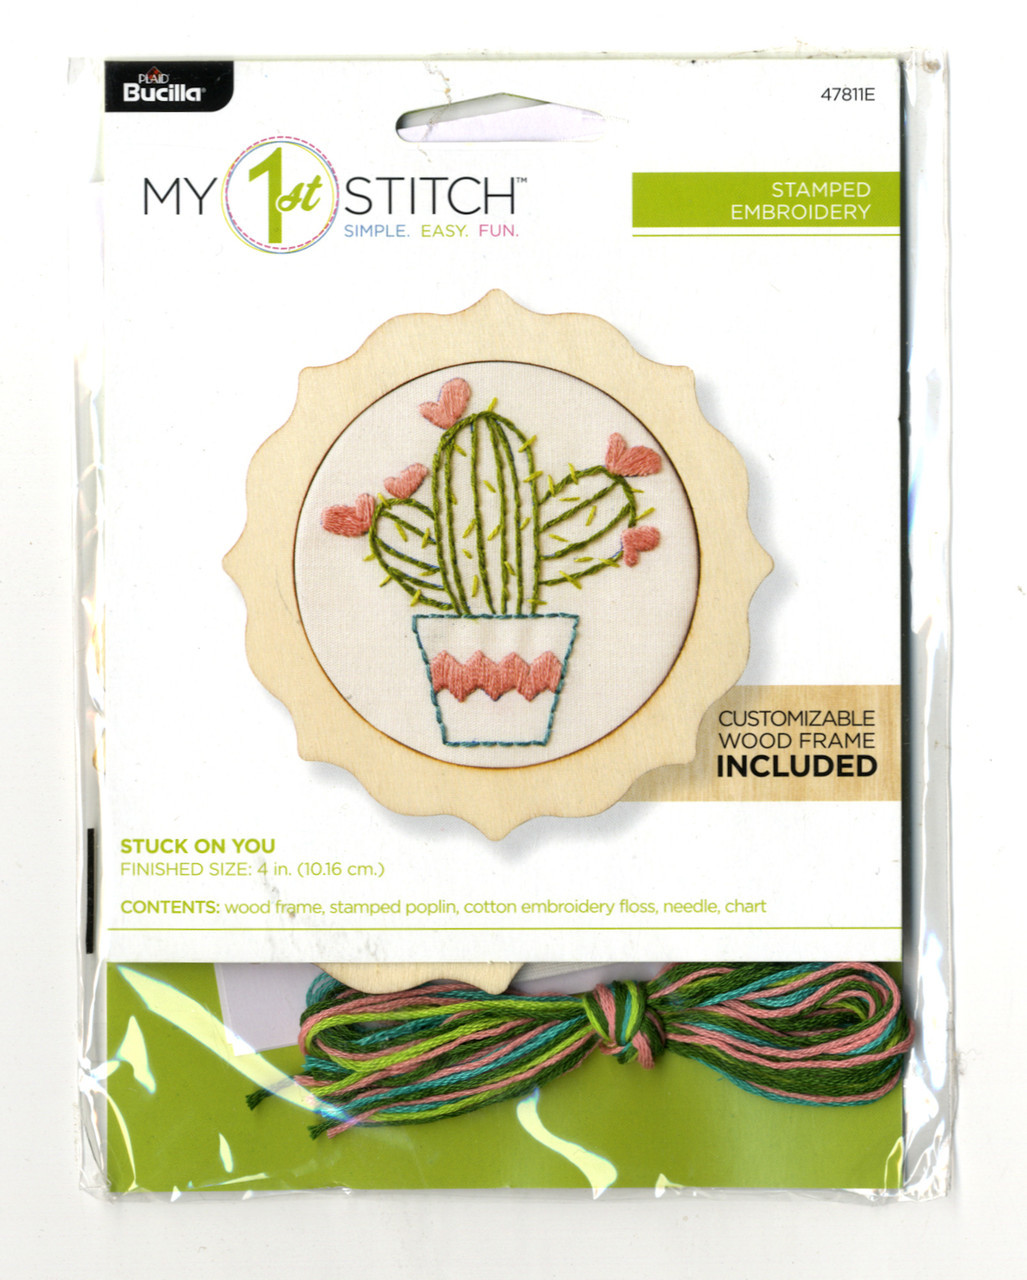 My 1st Stitch - Stuck on You